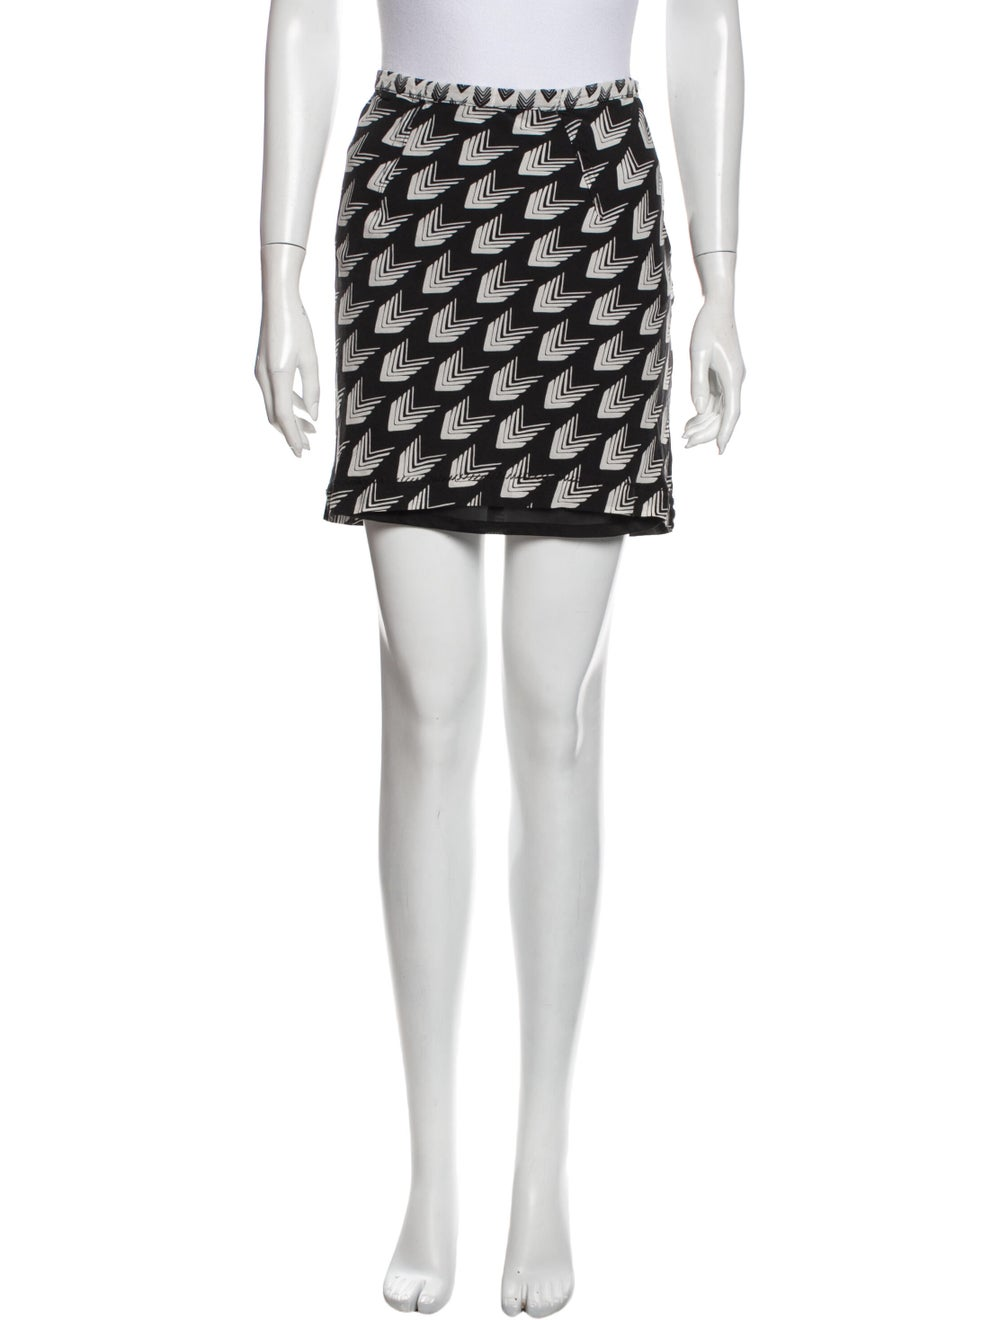 Rag & Bone Silk Mini Skirt Black - image 1